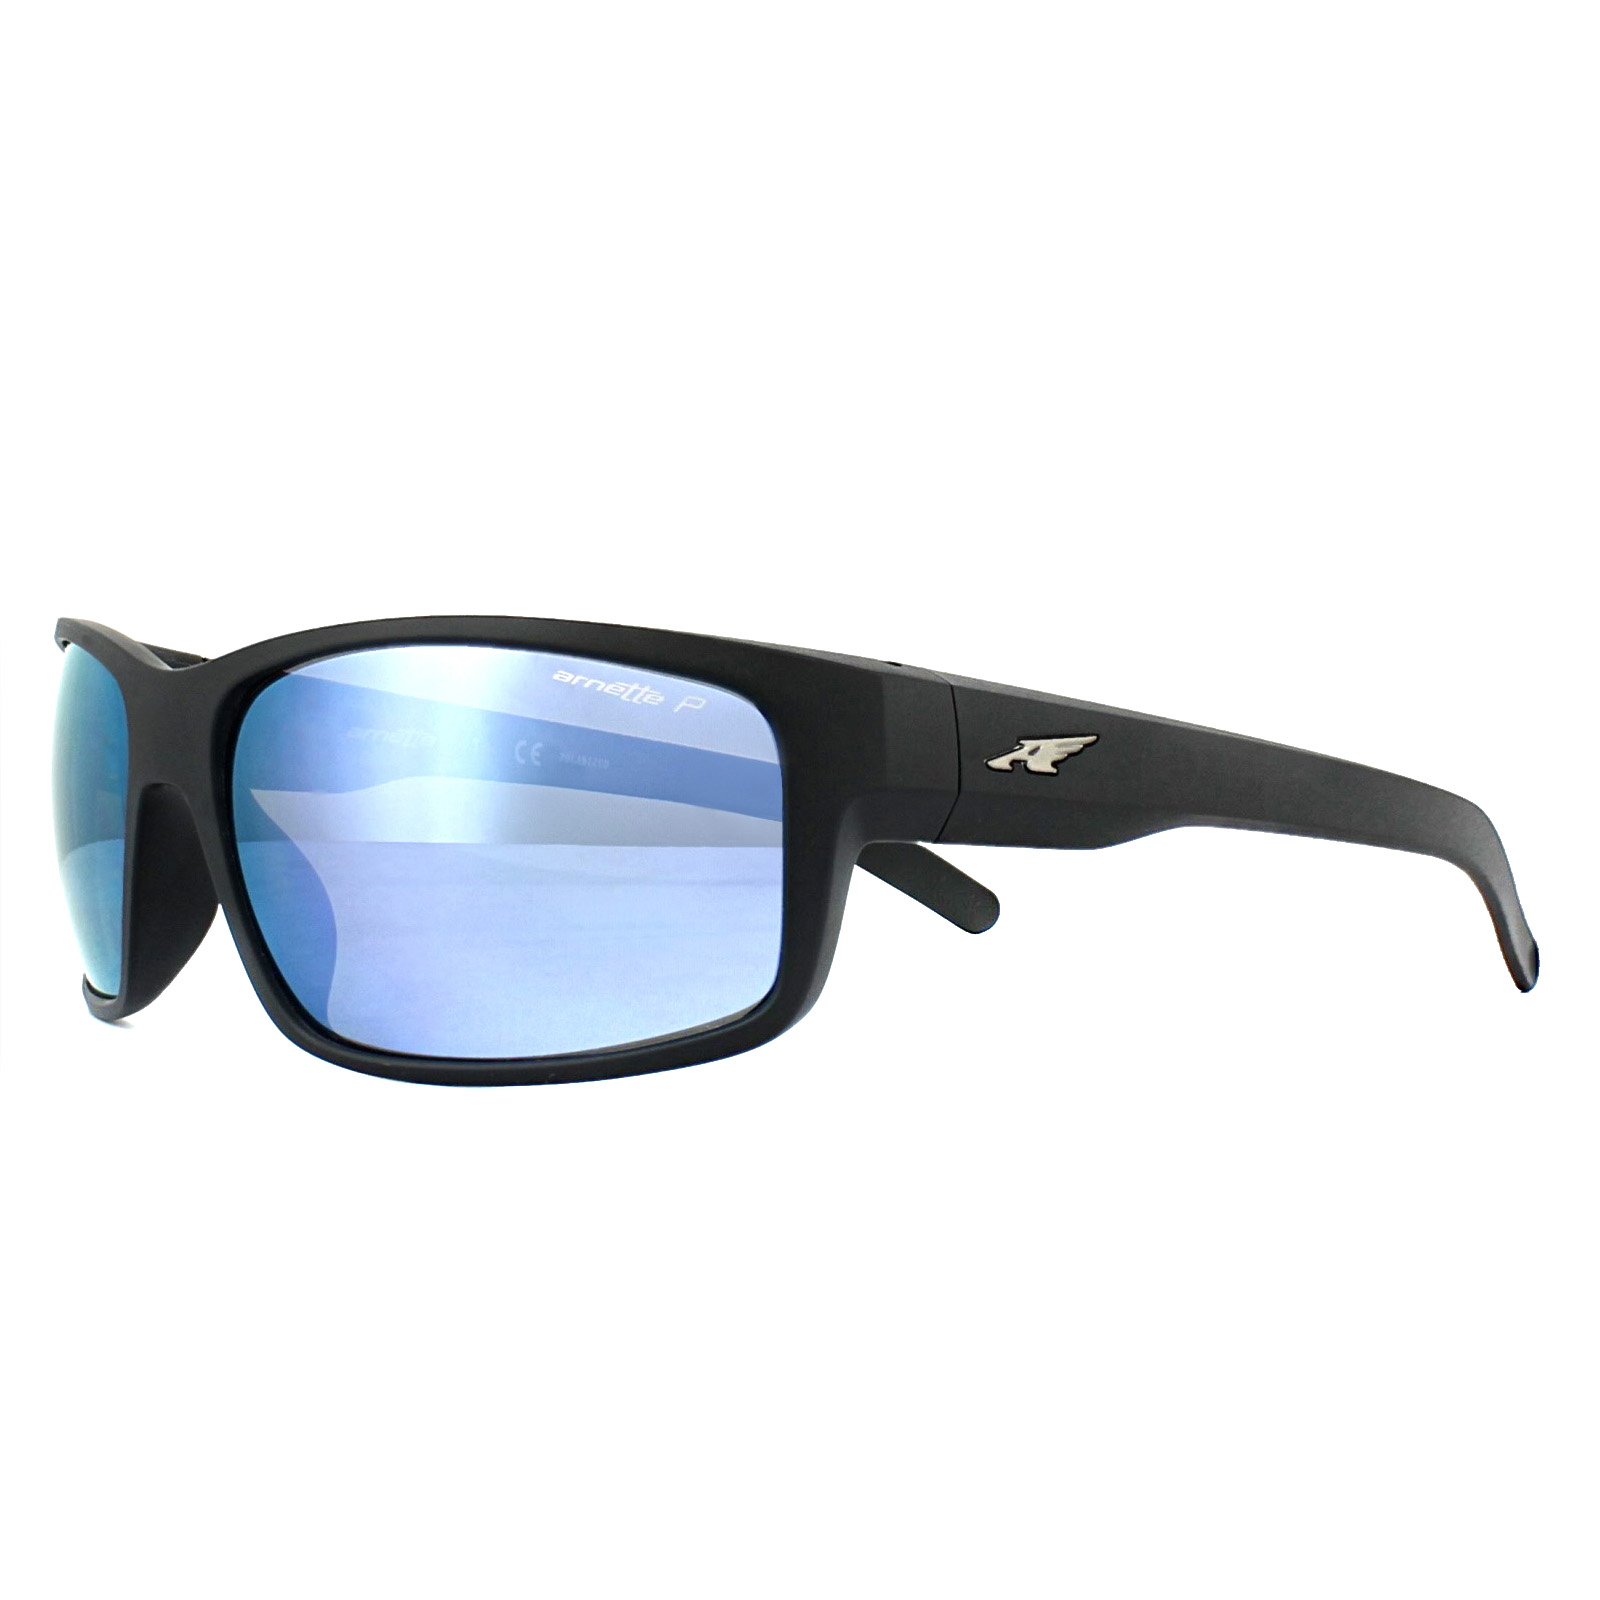 07ec9f4481 Sentinel Arnette Sunglasses Fastball 4202 01 22 Matt Black Grey Mirror Blue  Polarized